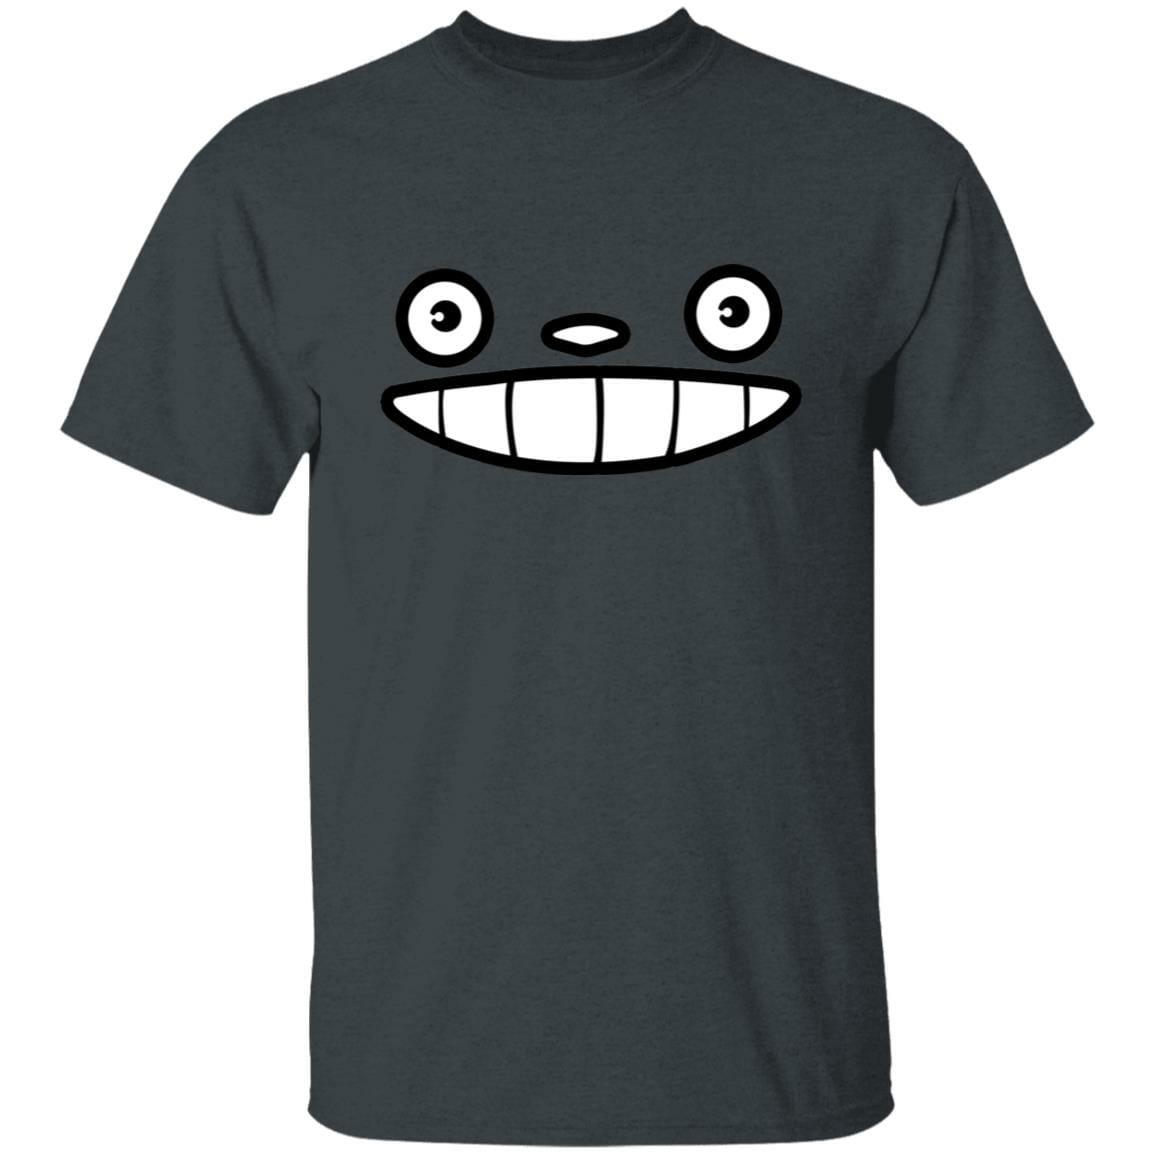 My Neighbor Totoro Face T Shirt